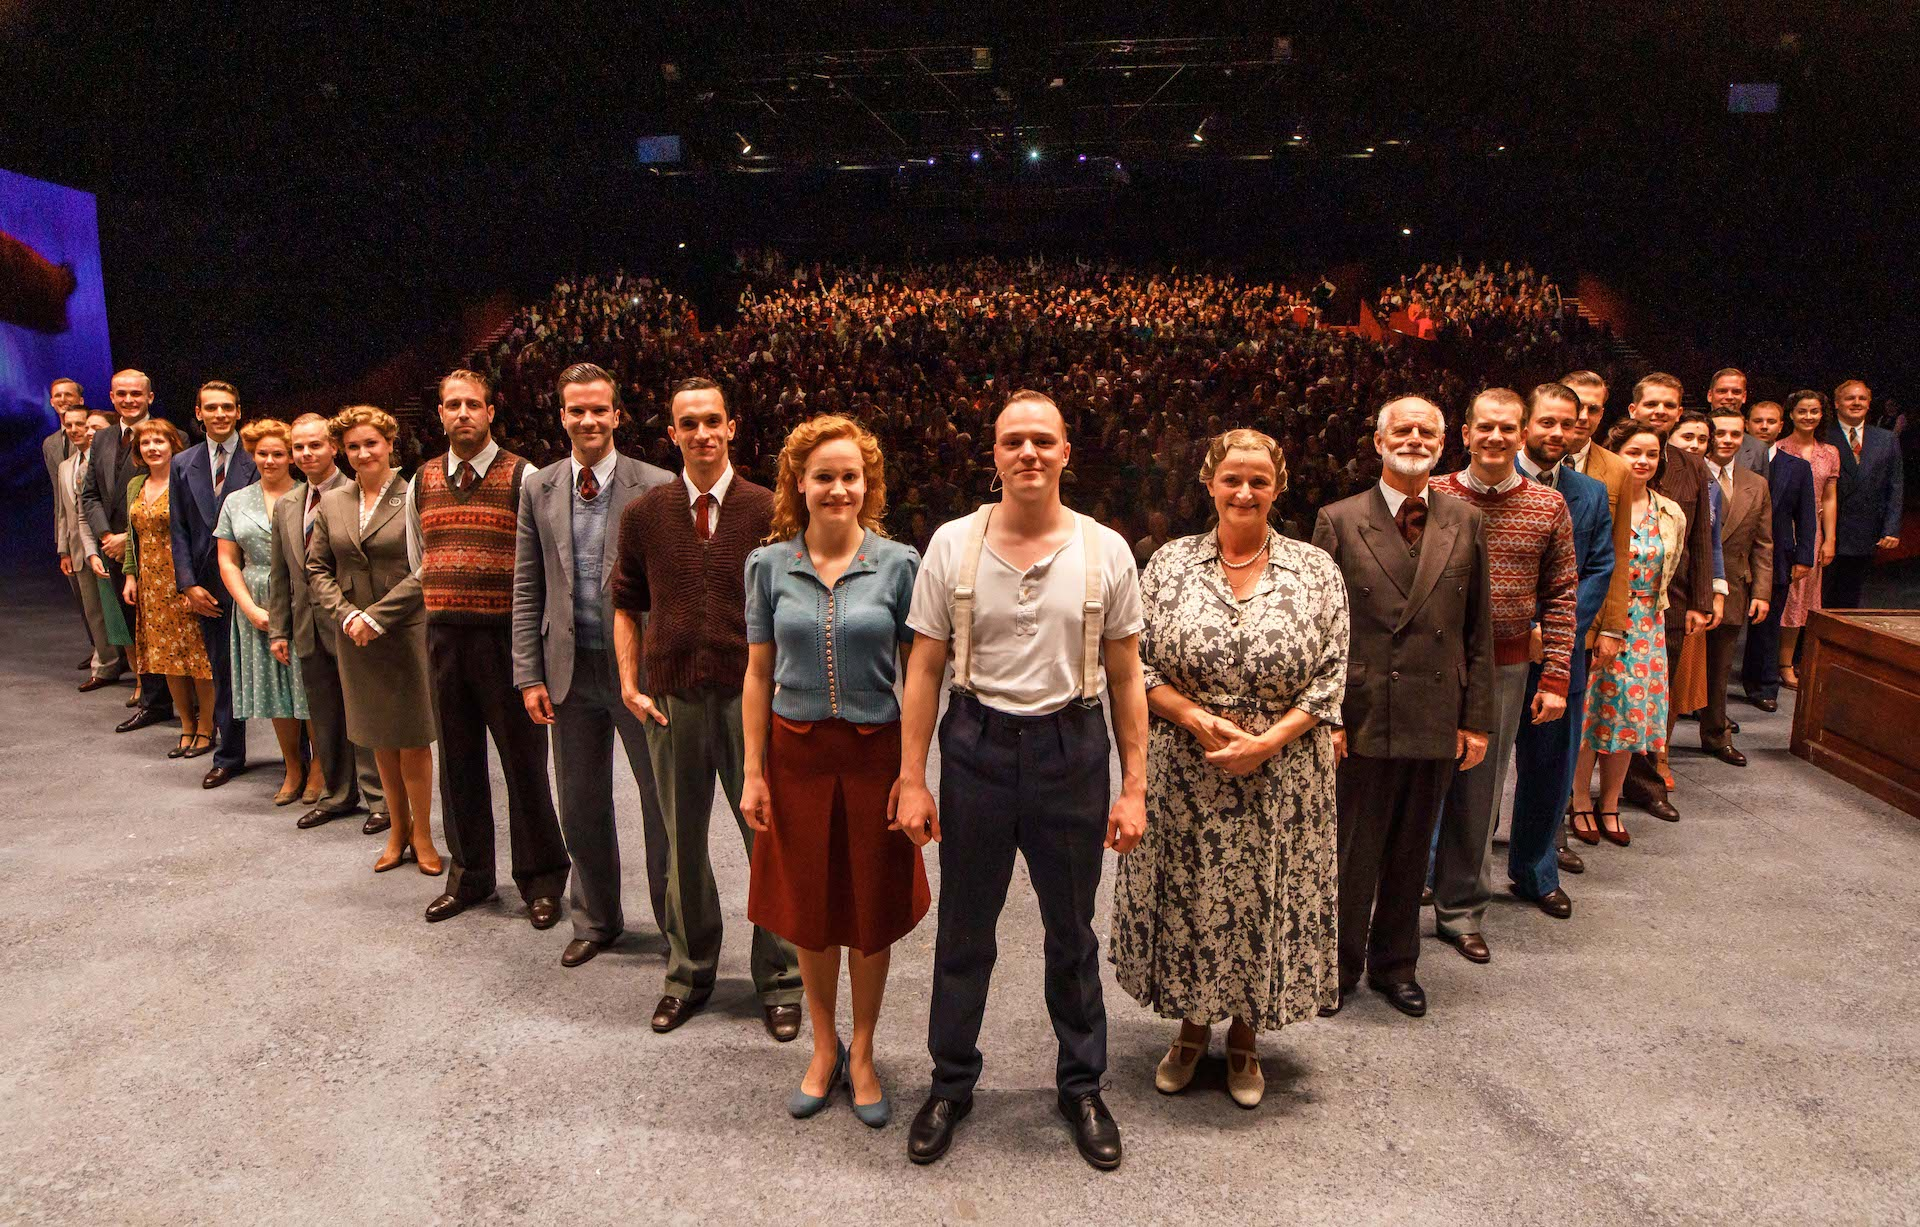 Soldaat van Oranje - De Musical speelt 2.750ste voorstelling